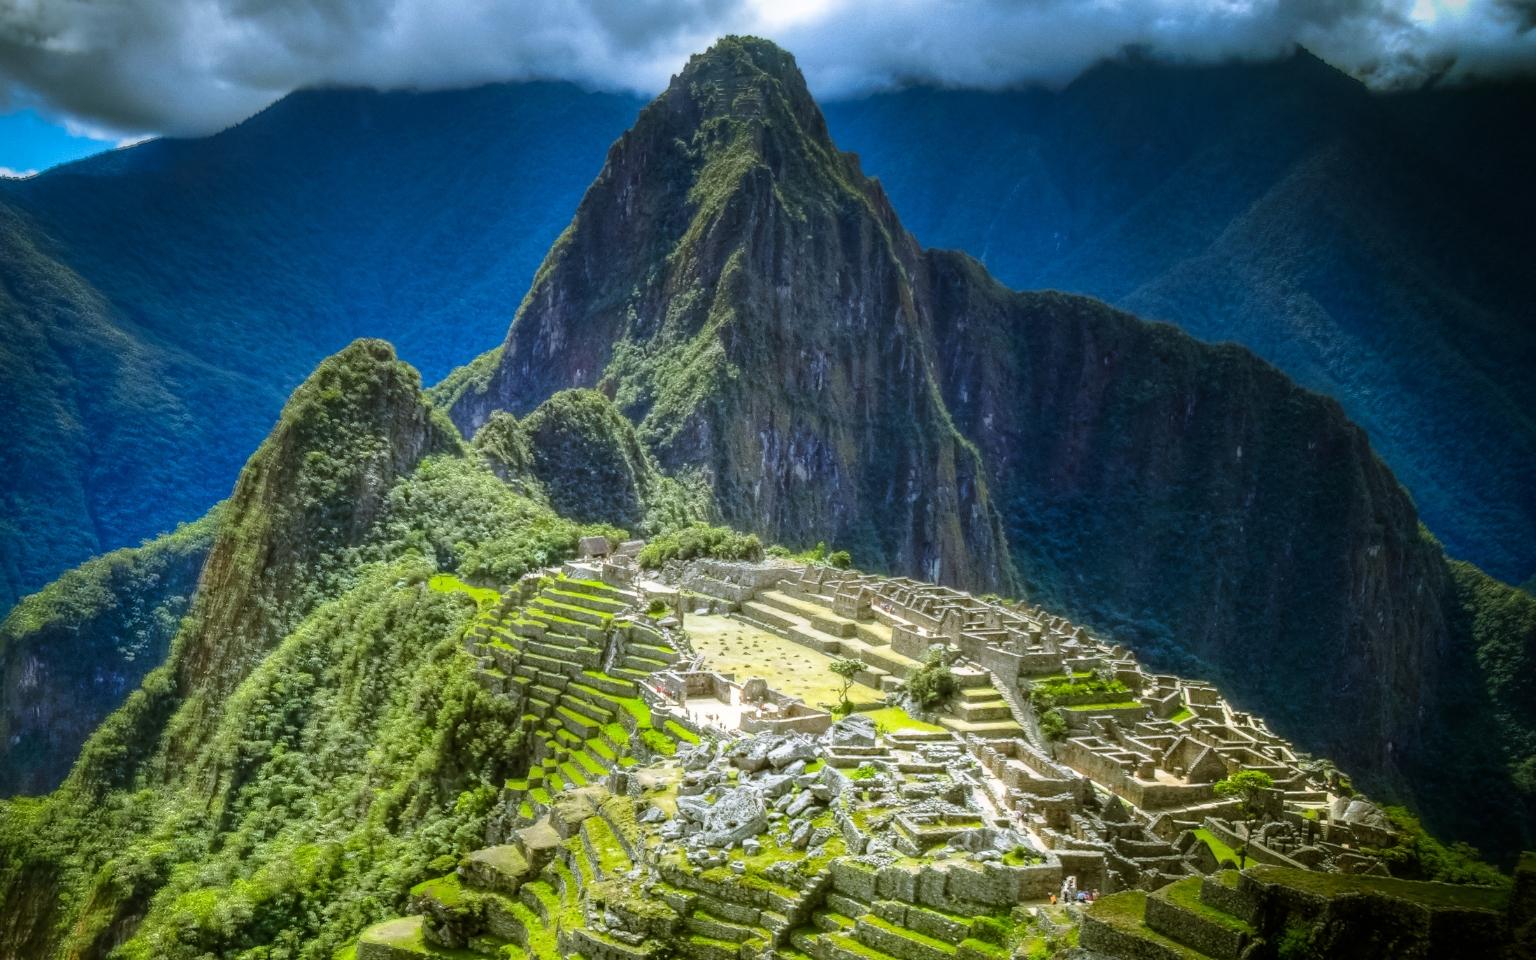 Trips To Machu Picchu For Young Adults